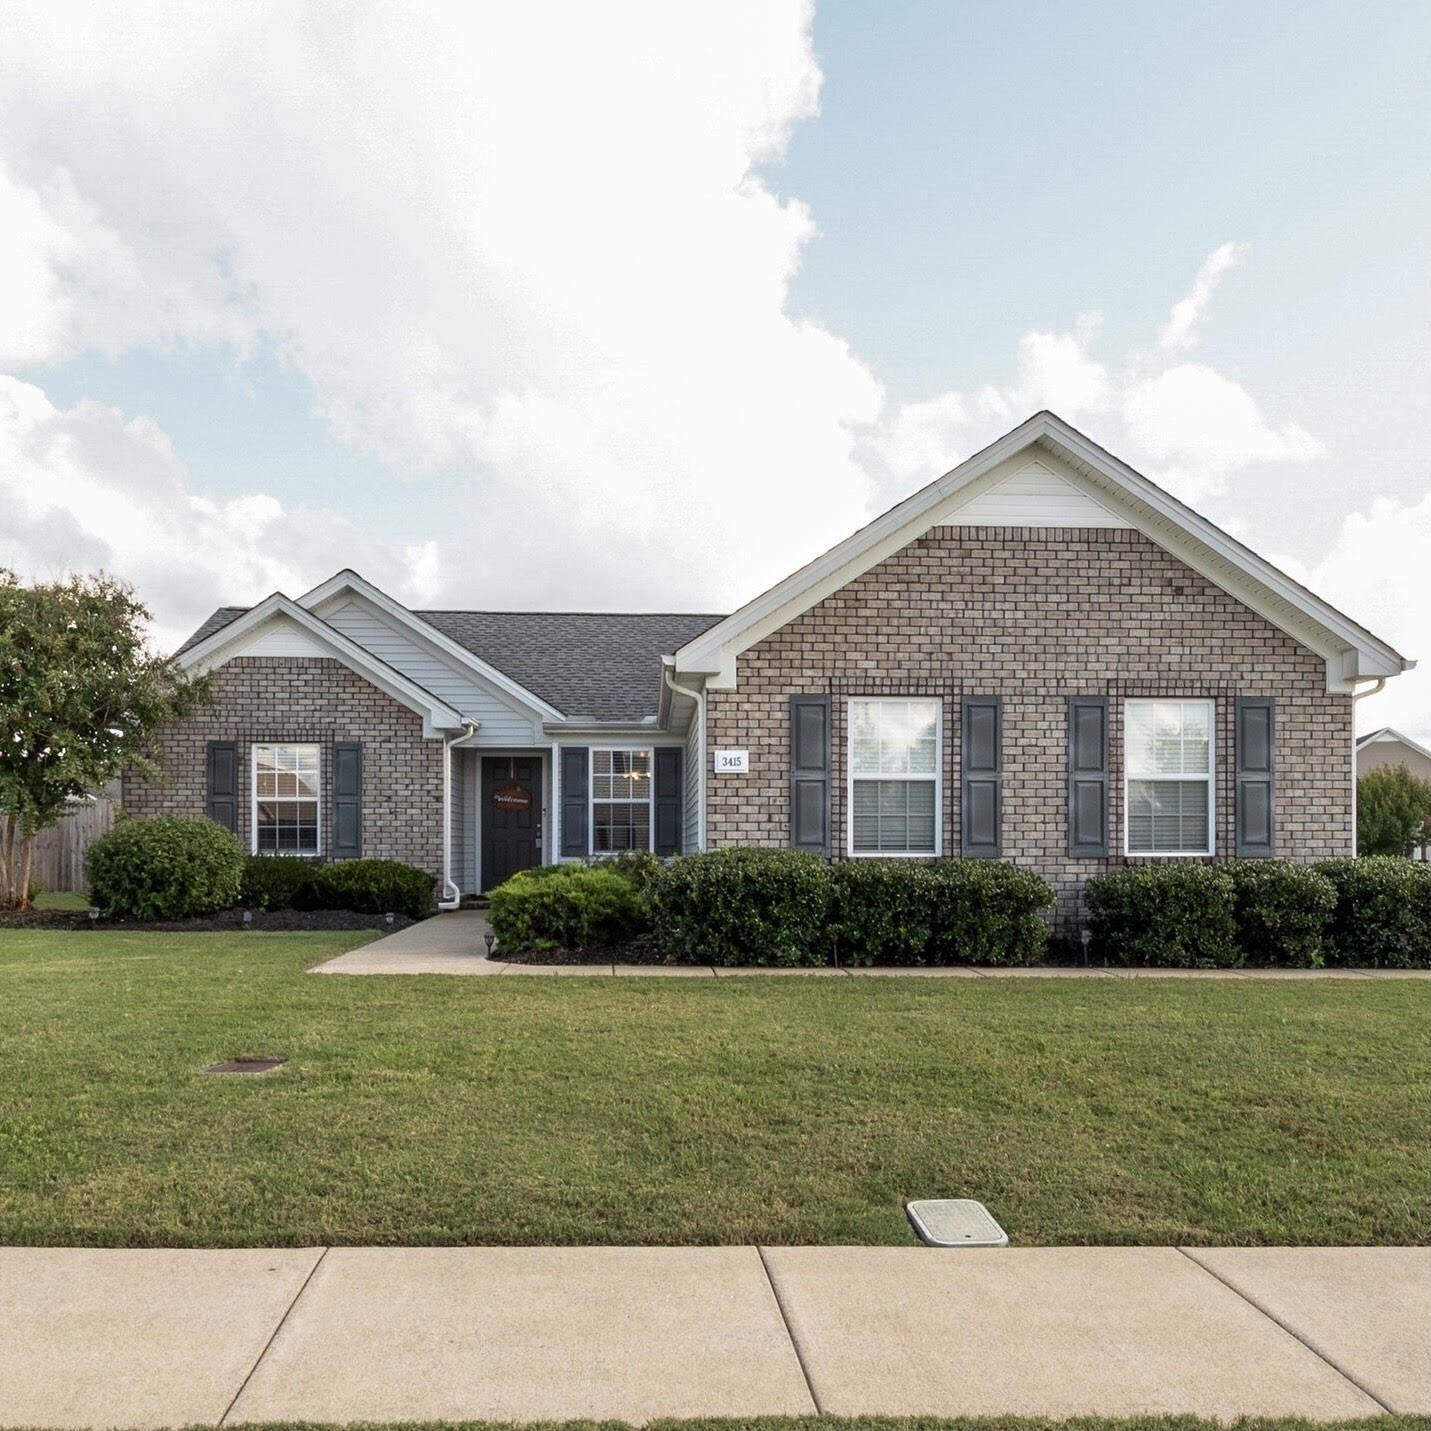 Photo of 3415 Perlino Dr, Murfreesboro, TN 37128 (MLS # 2299771)